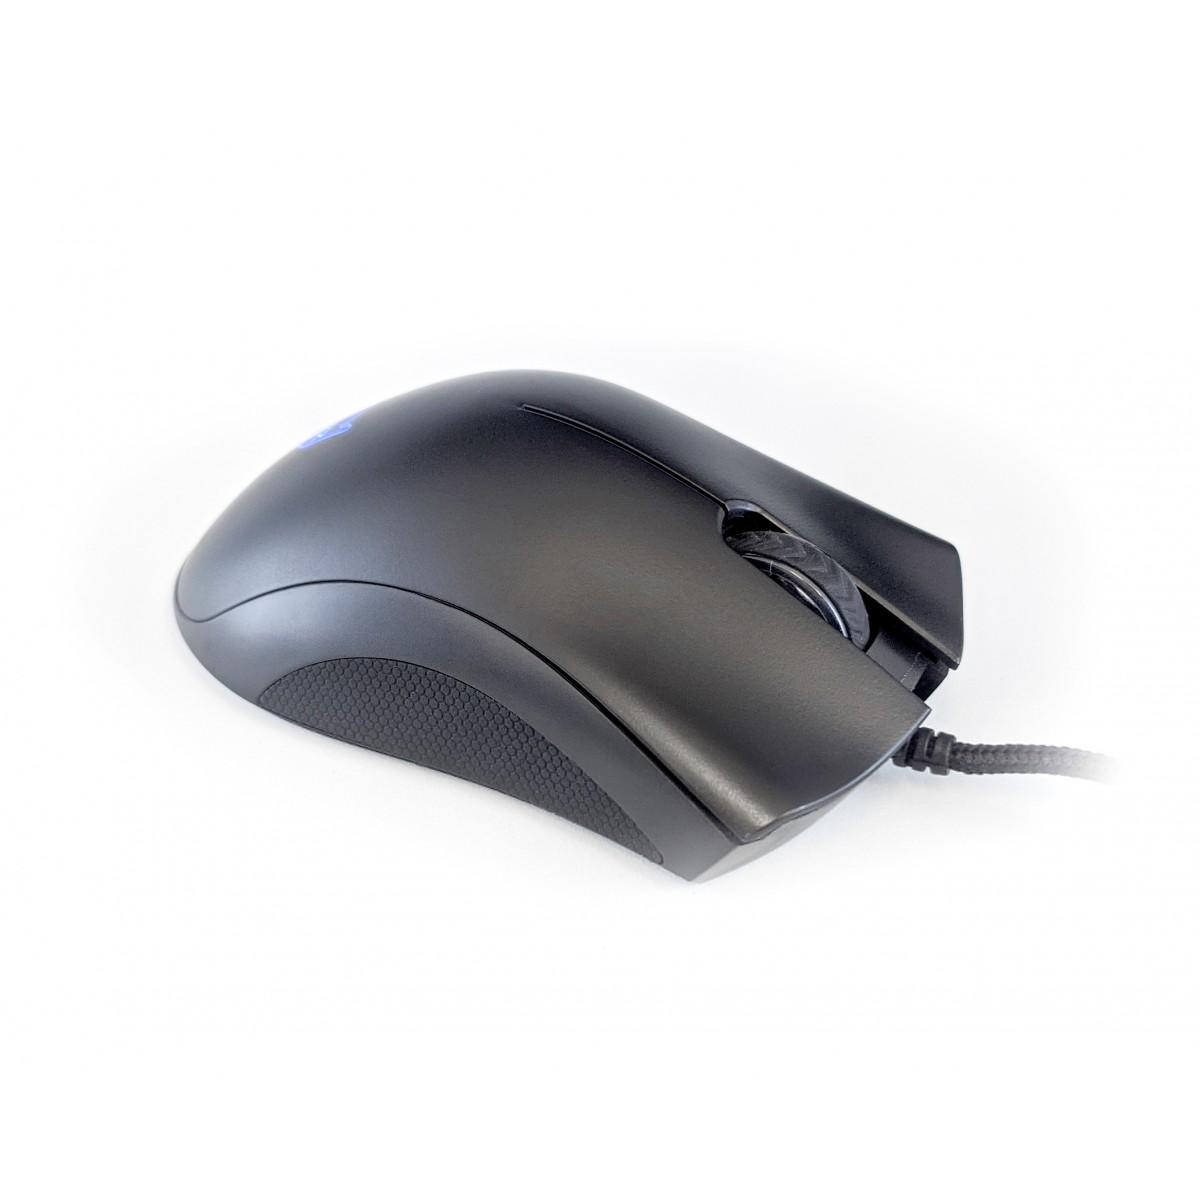 Mouse Gamer Dazz, Axon, 3200DPI, USB, 6 Botões, 62000032